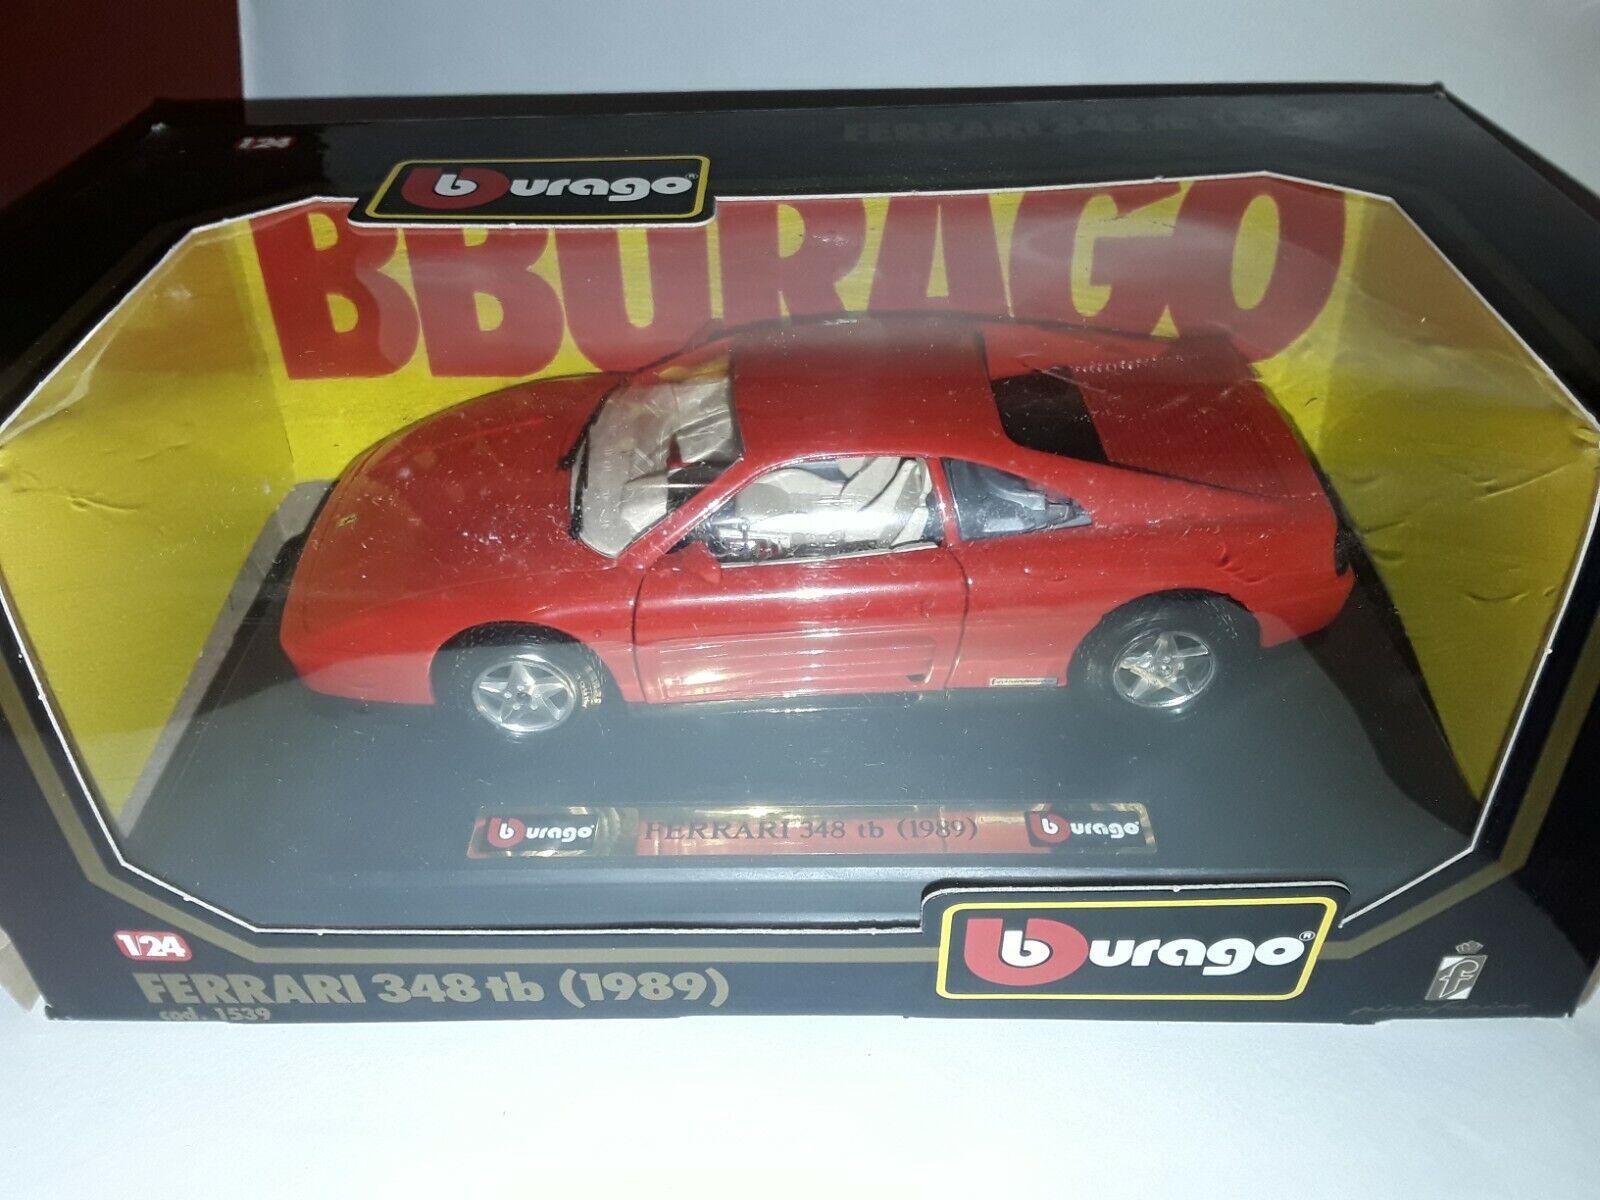 FERRARI 348 tb (1989) BURAGO au 1:24